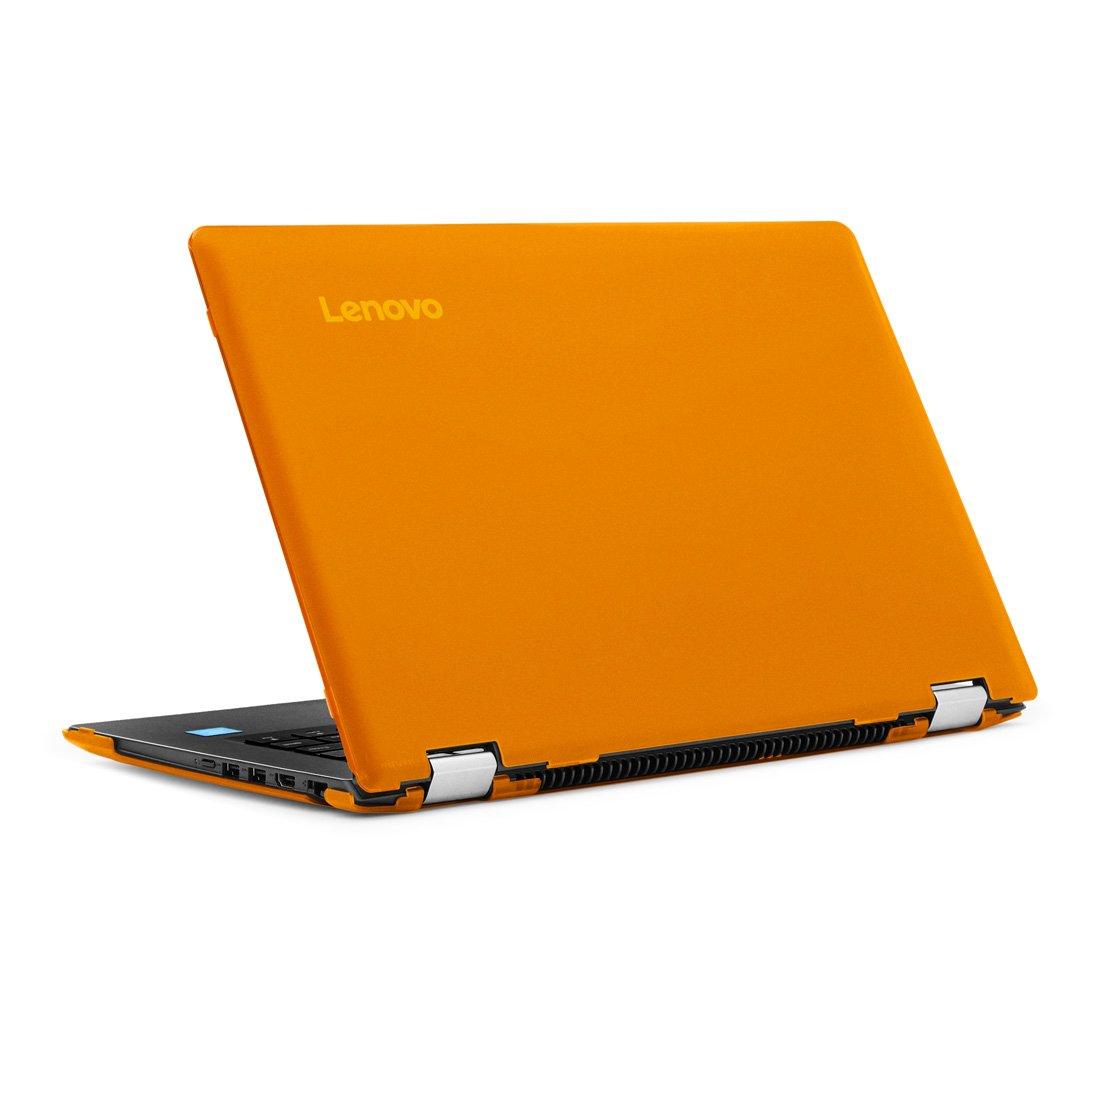 Funda rígida mCover para 14 pulgadas de Yoga 510 computadoras portatiles (** NO compatible con Yoga 530 / Yoga 520 de 14 pulgadas **)